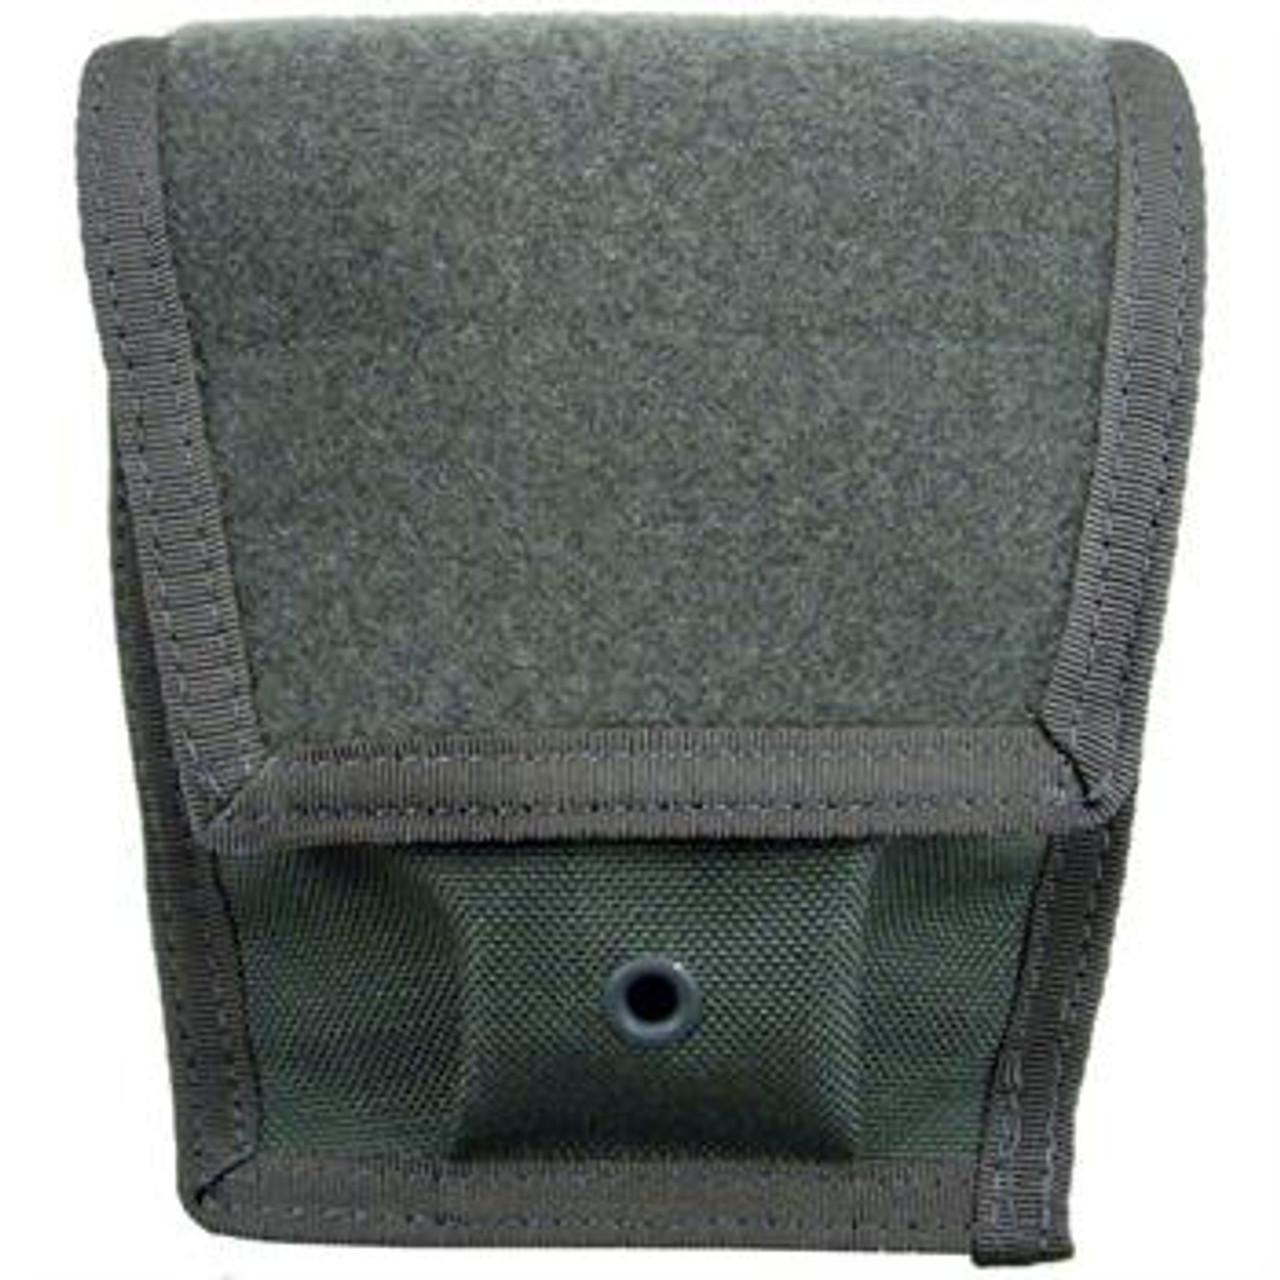 Maxpedition Double Handcuff Pouch| Color| Foliage Green